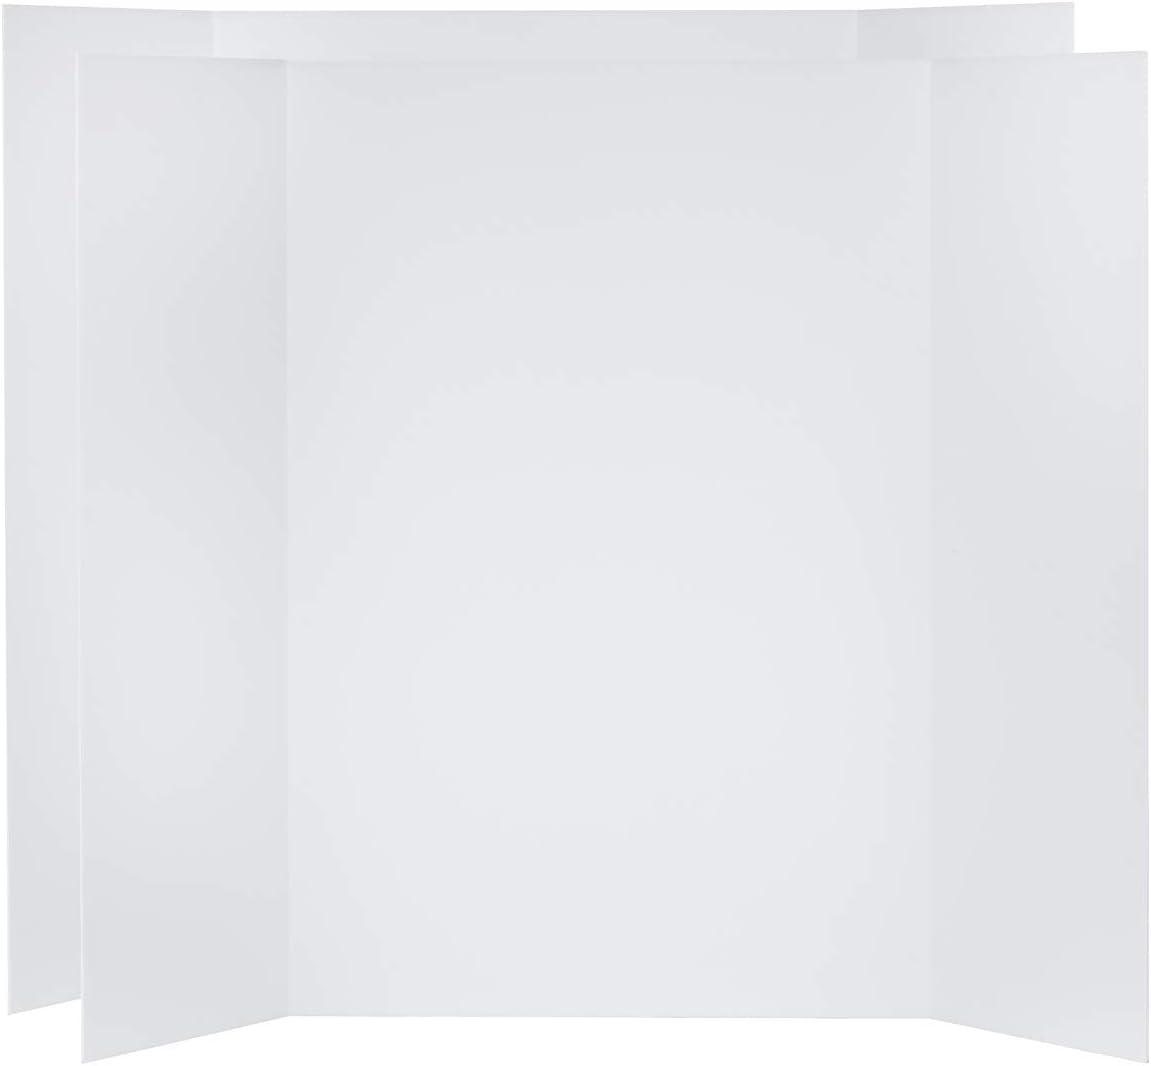 4-Pack, White, Folded Size: 24x36 inches V-FLAT WORLD 48x36-inch Tri-Fold Foam Board